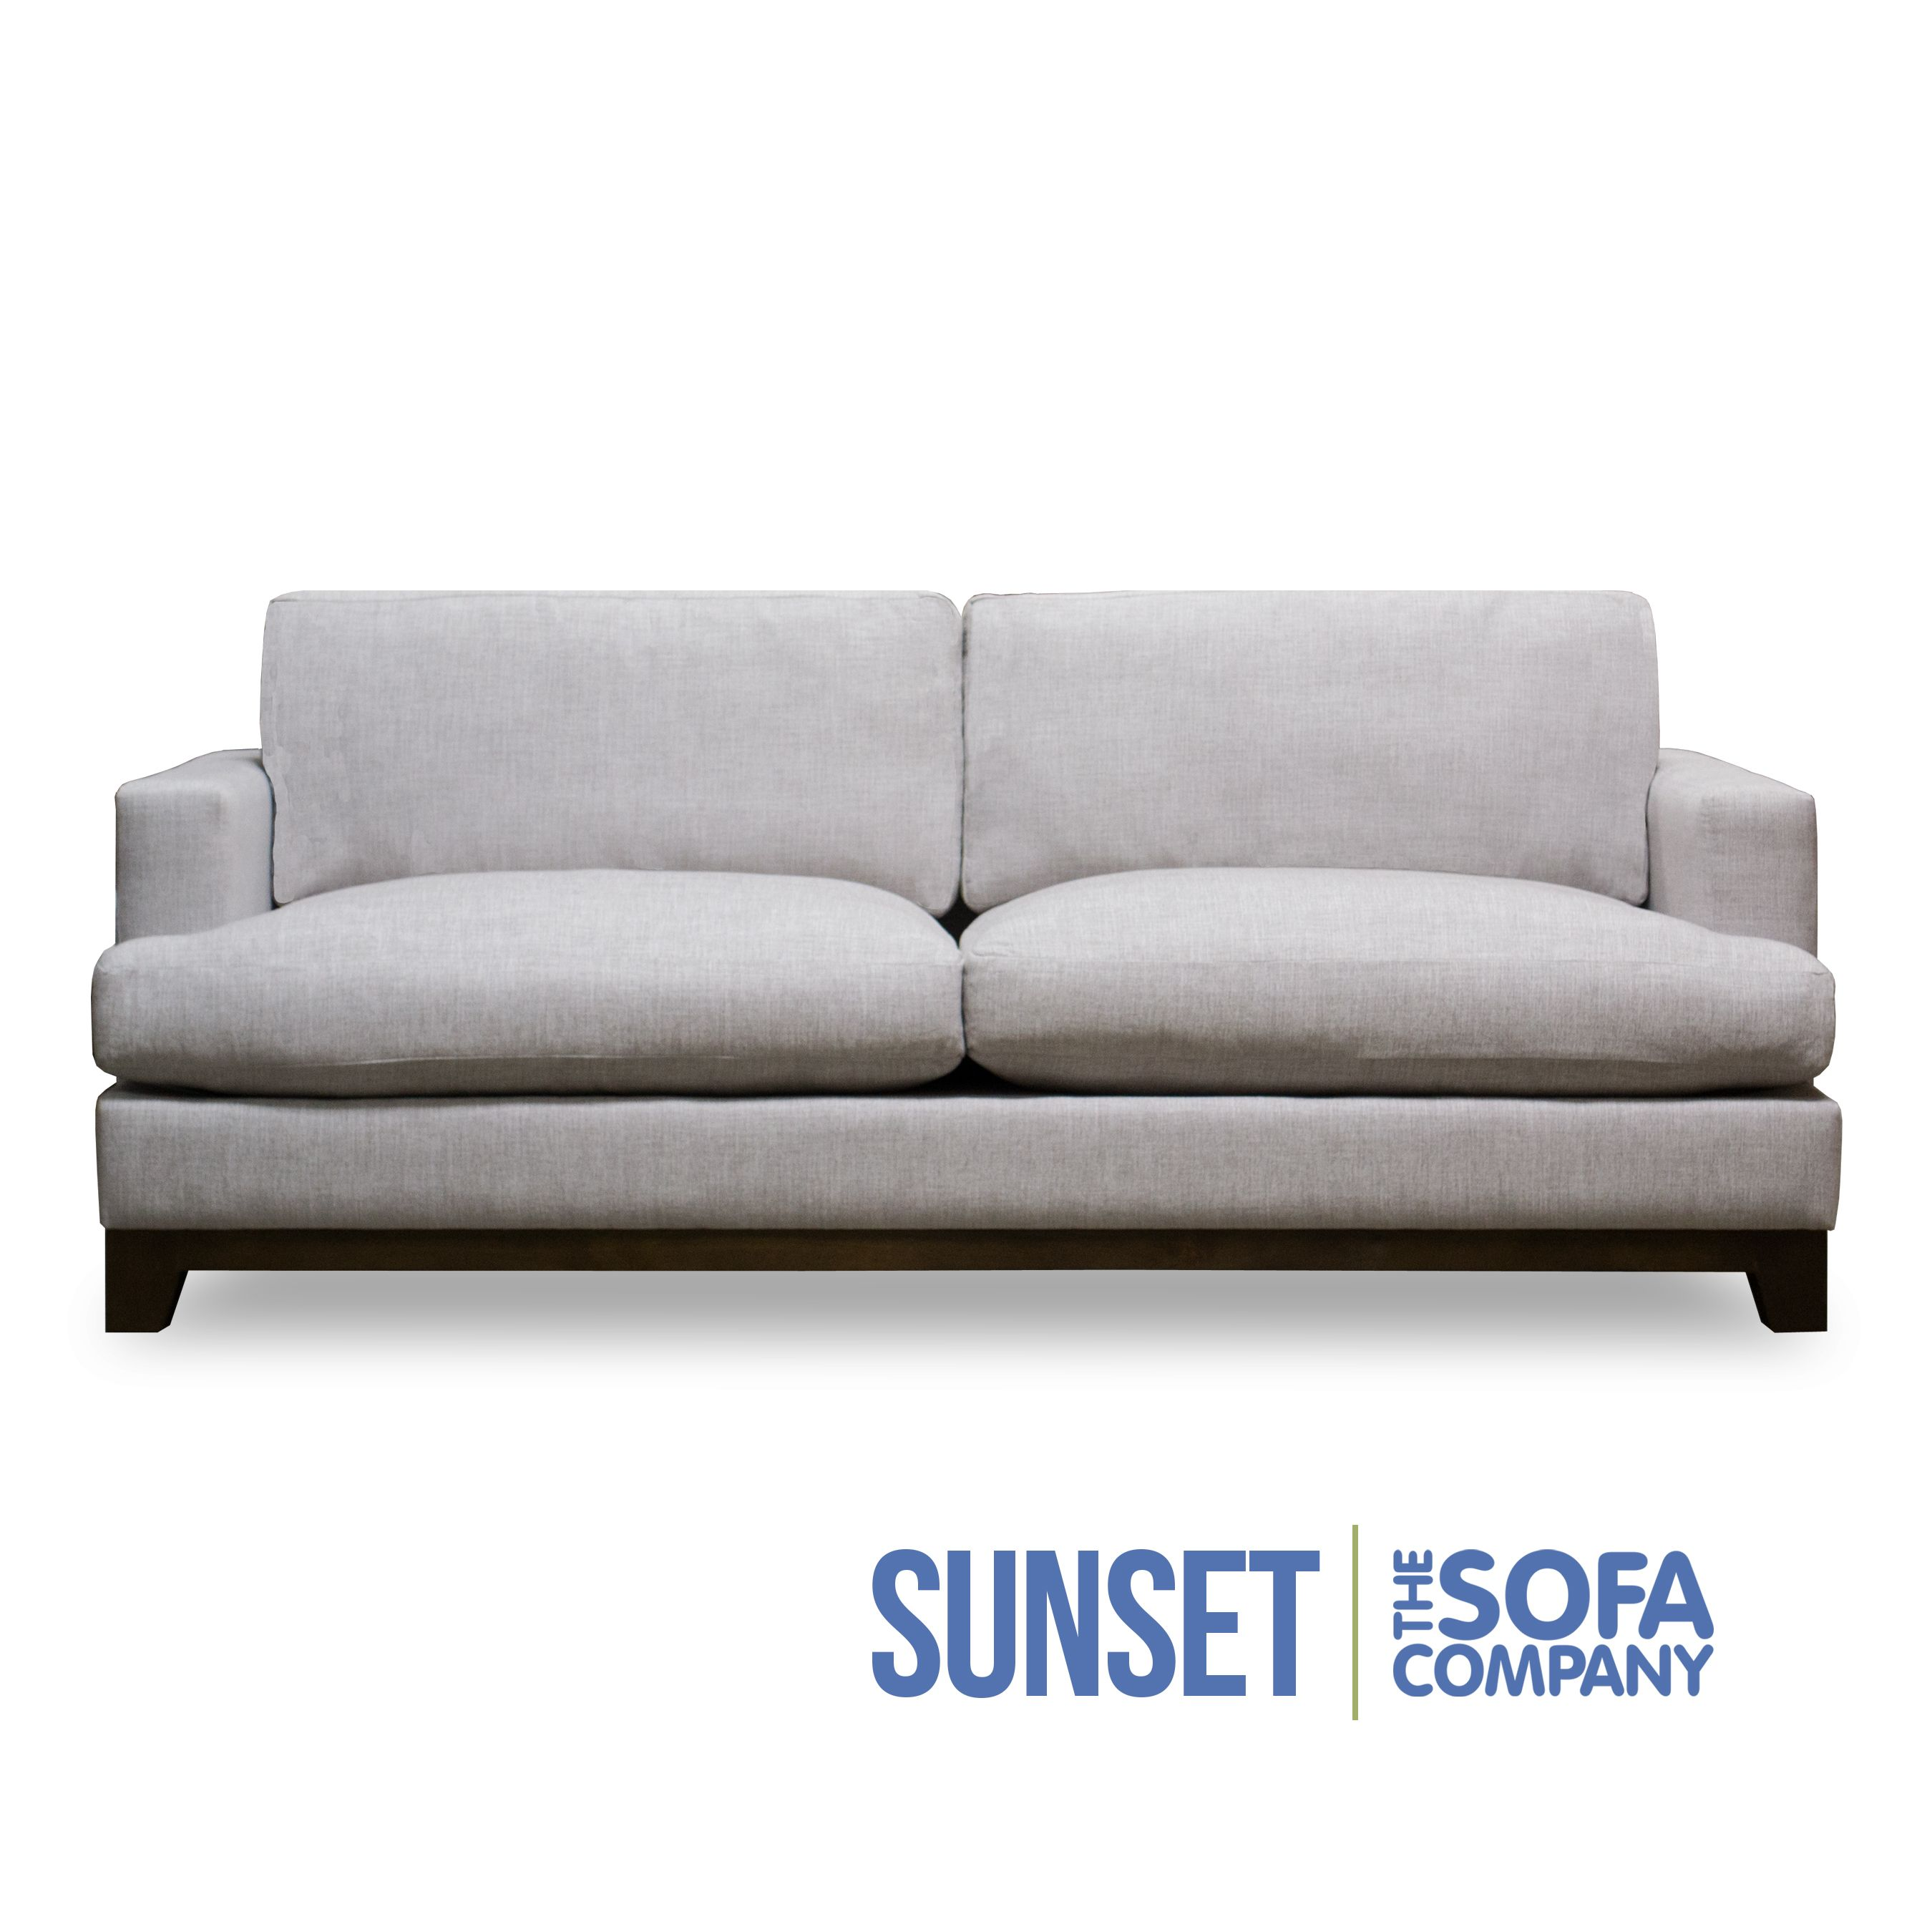 Sunset Sofa Style By The Sofa Company Www Thesofaco Com Sofa